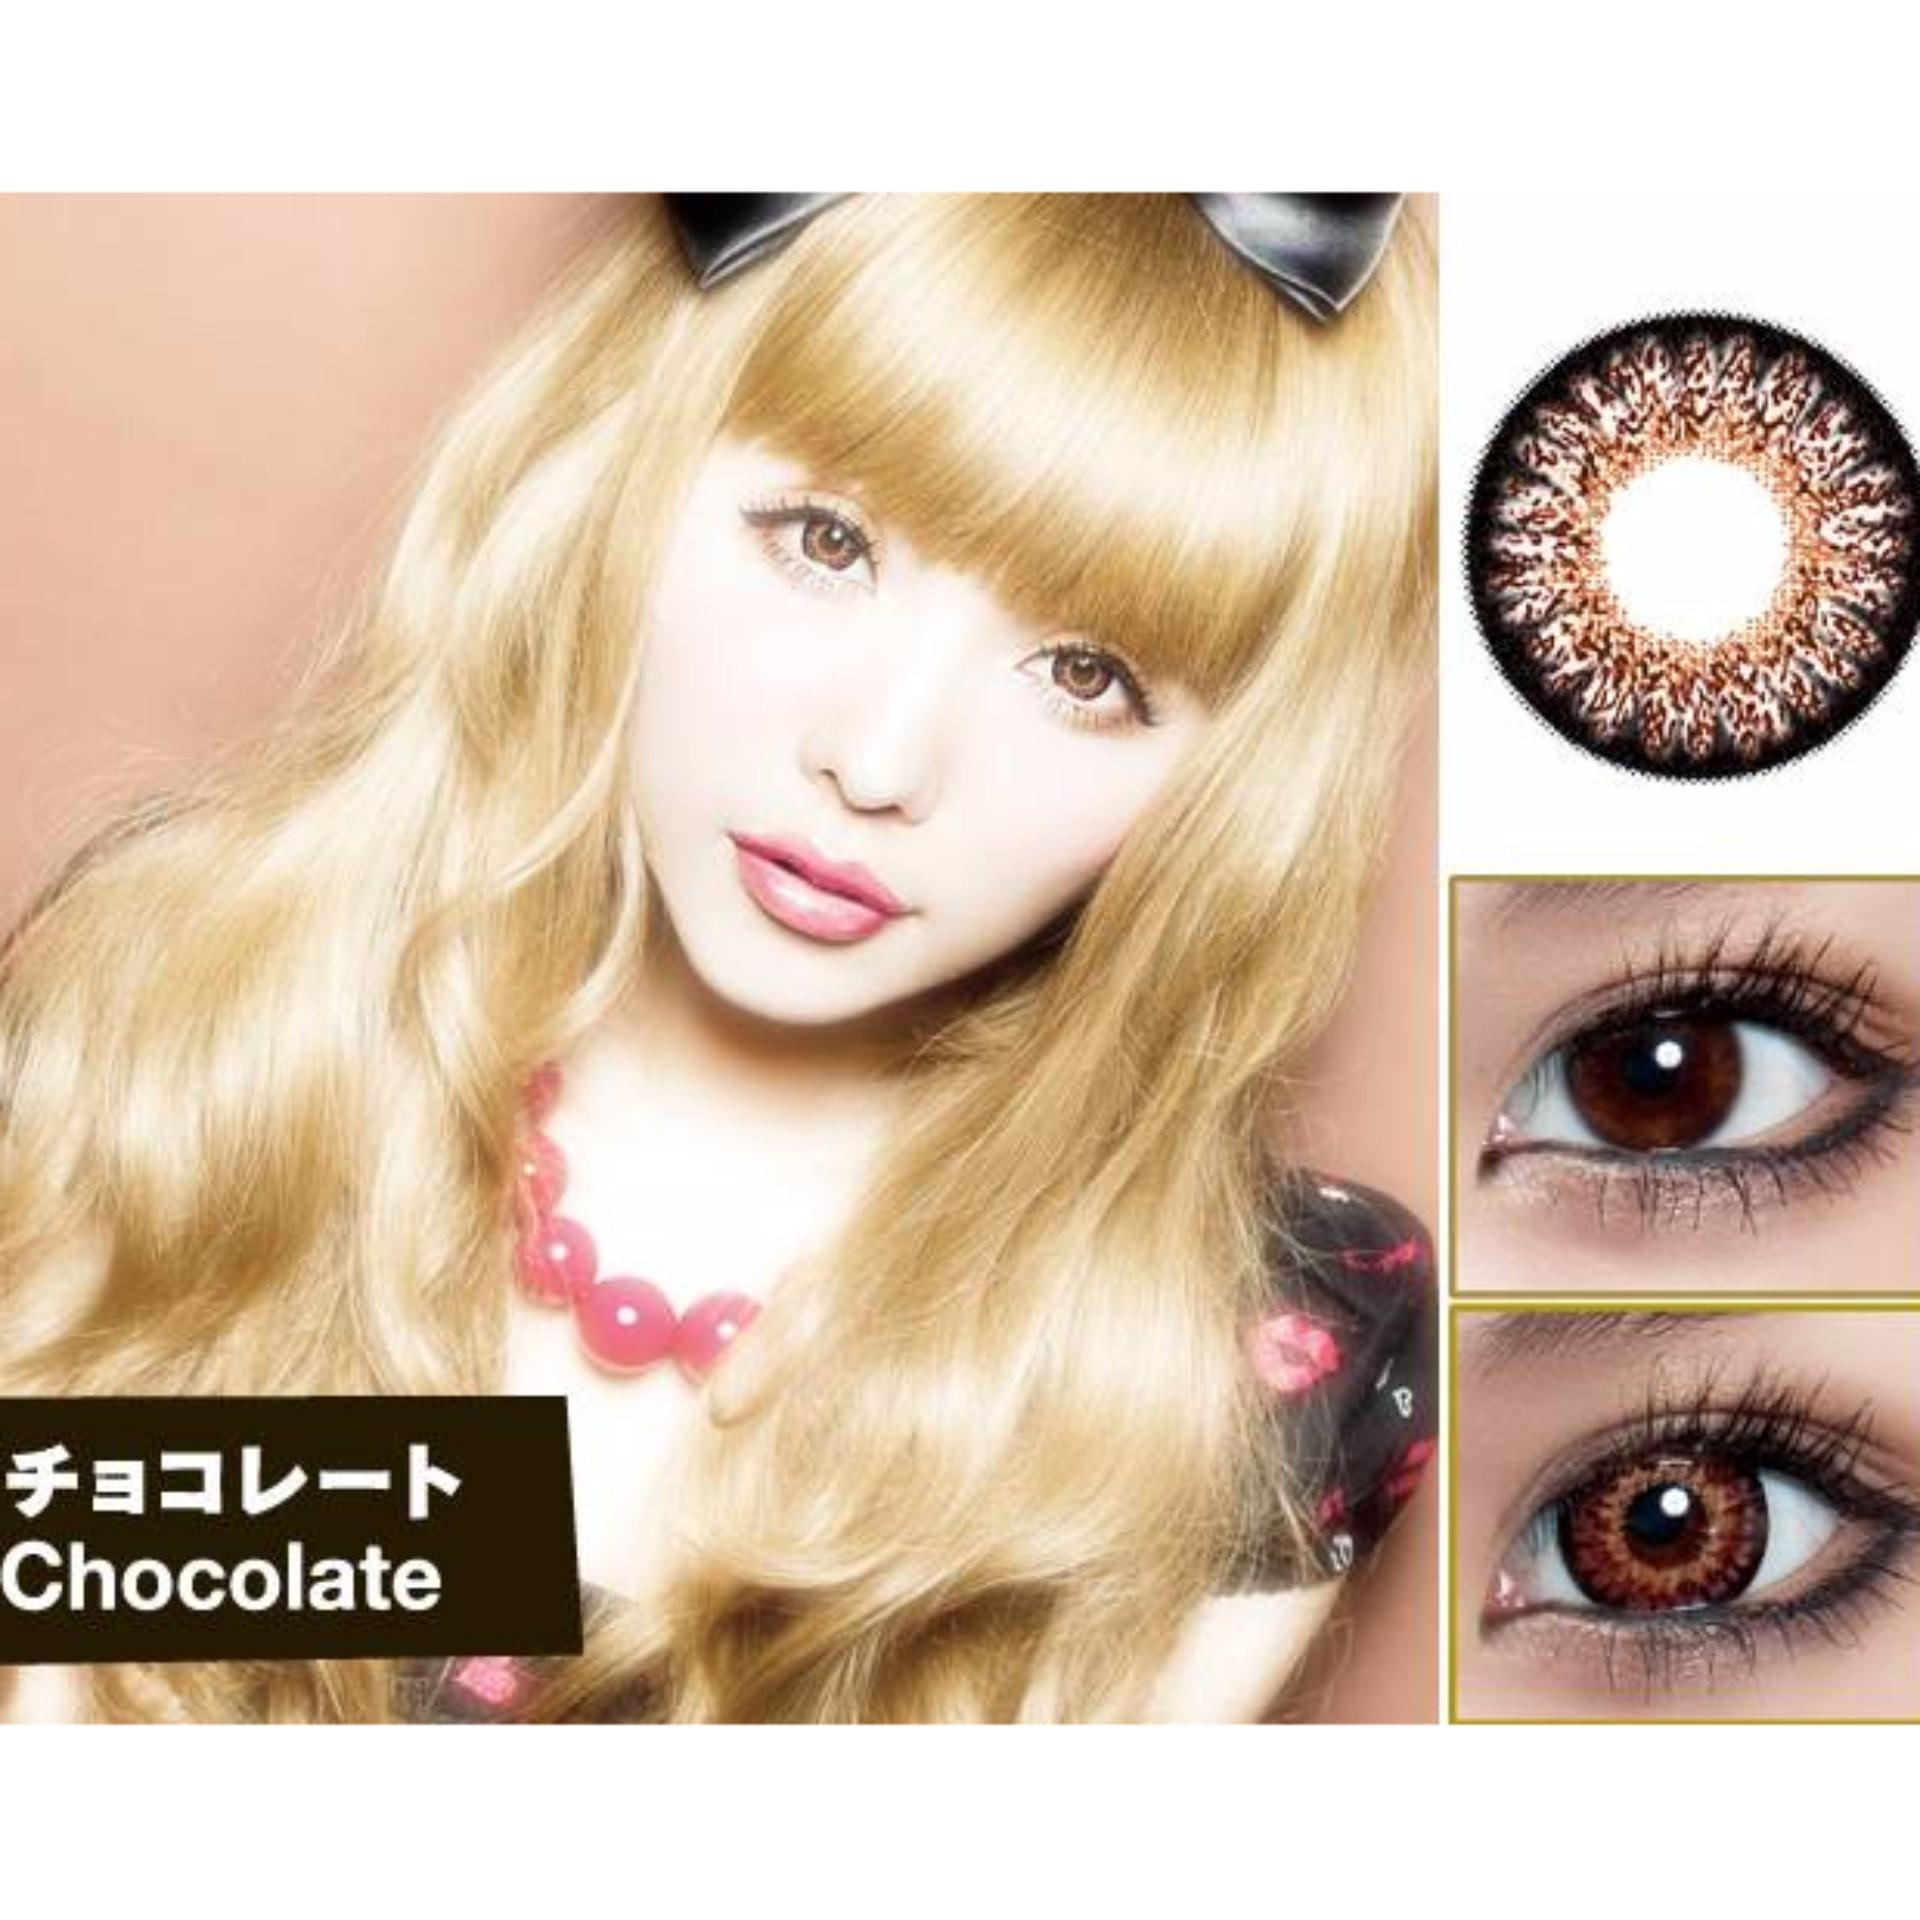 Geo Anime Sharingan Cp S9 Gratis Solution 60ml Lens Case Daftar Source · Softlens GEO Princess